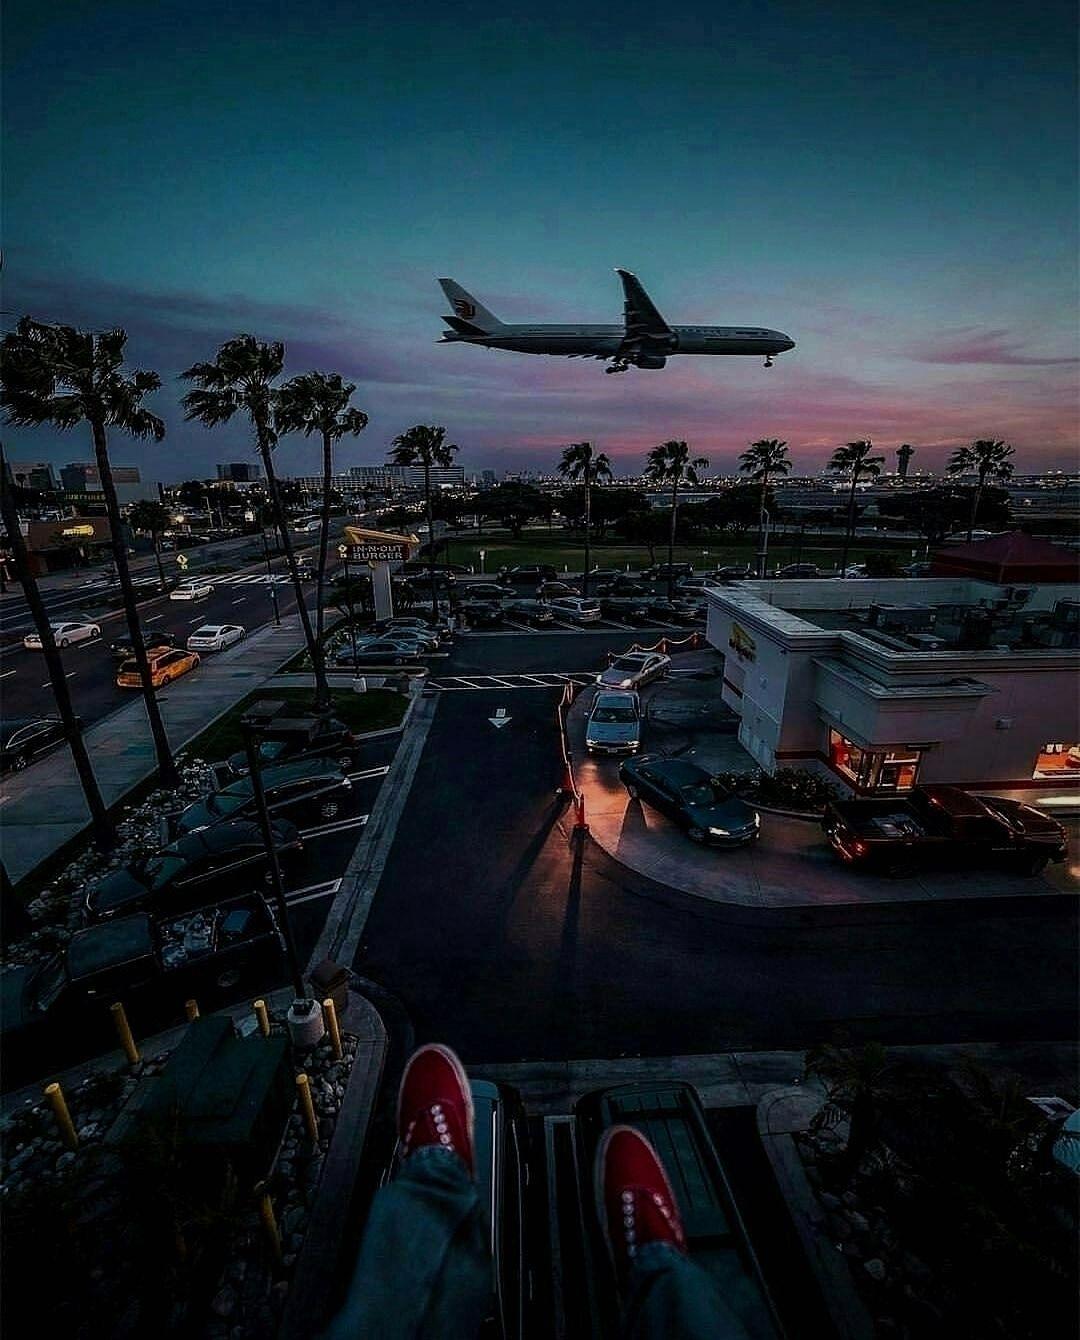 Wanderlust Los Angeles On Instagram Wanderlust Los Angeles Enjoy Some Summer Vibes In 2020 Los Angeles International Airport Vacation Places Summer Vibes